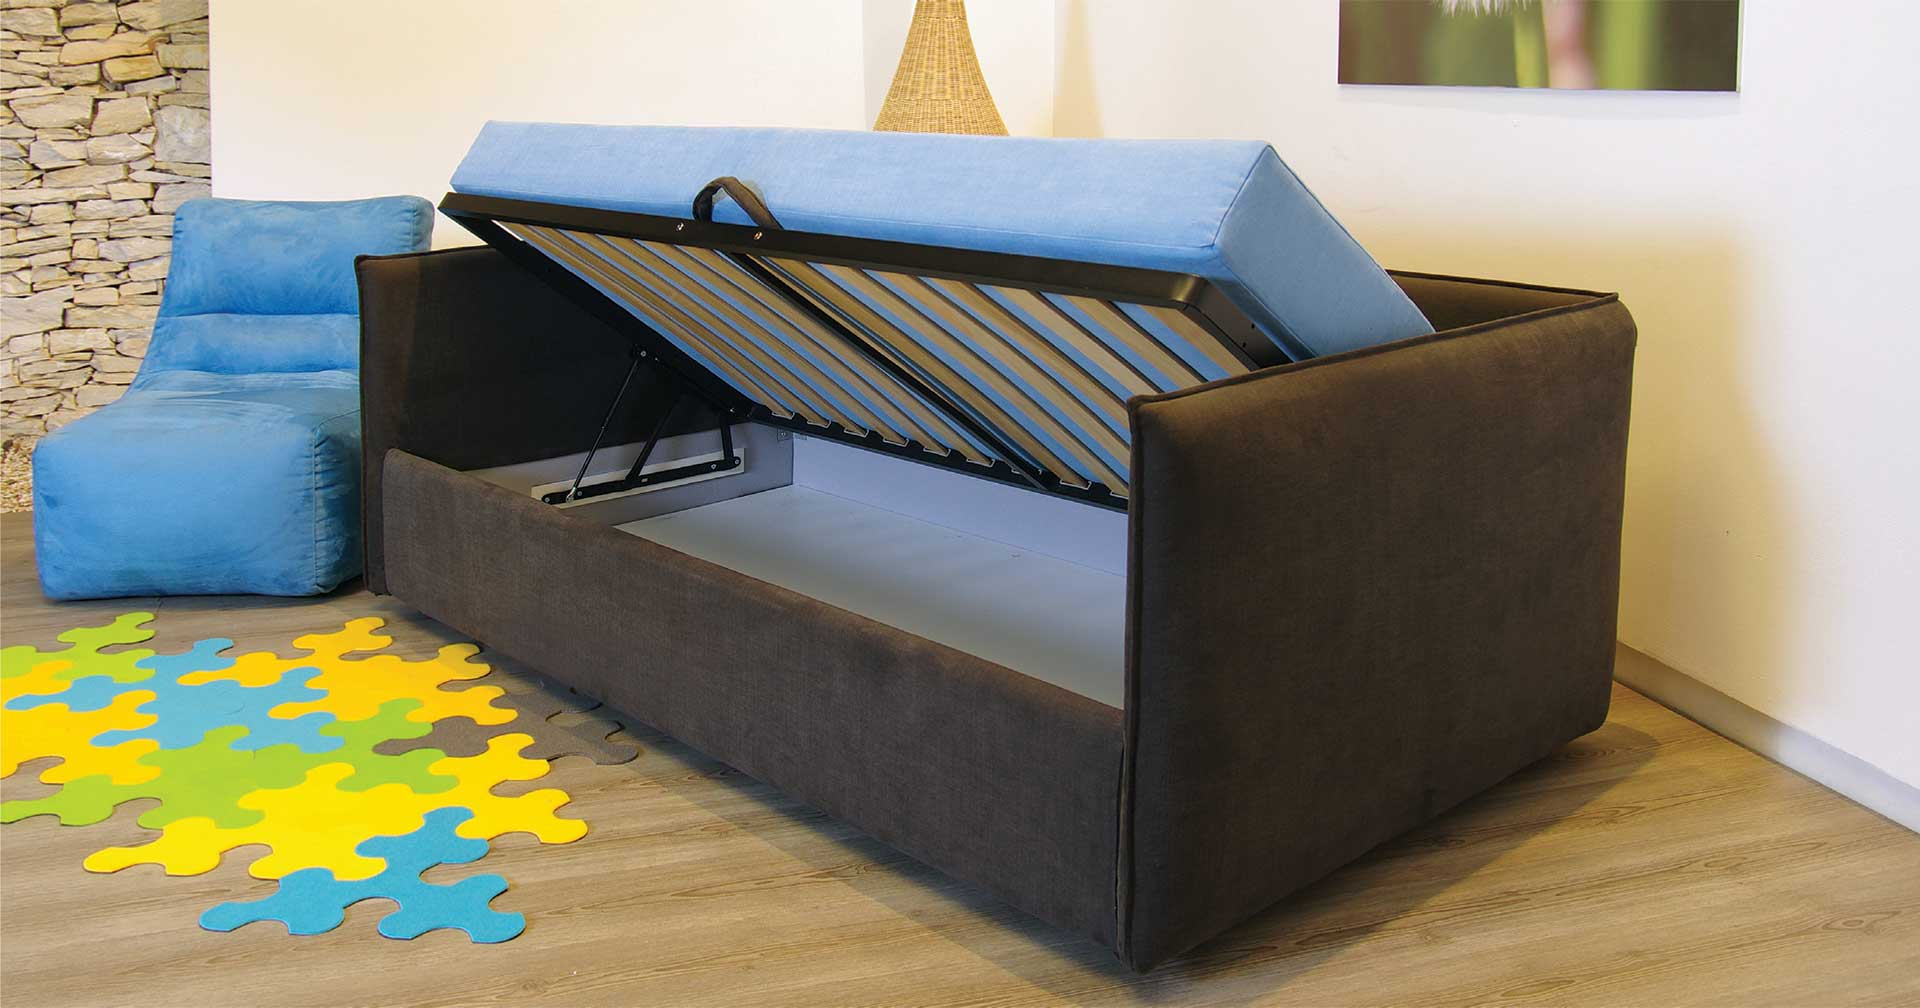 viengules lovos